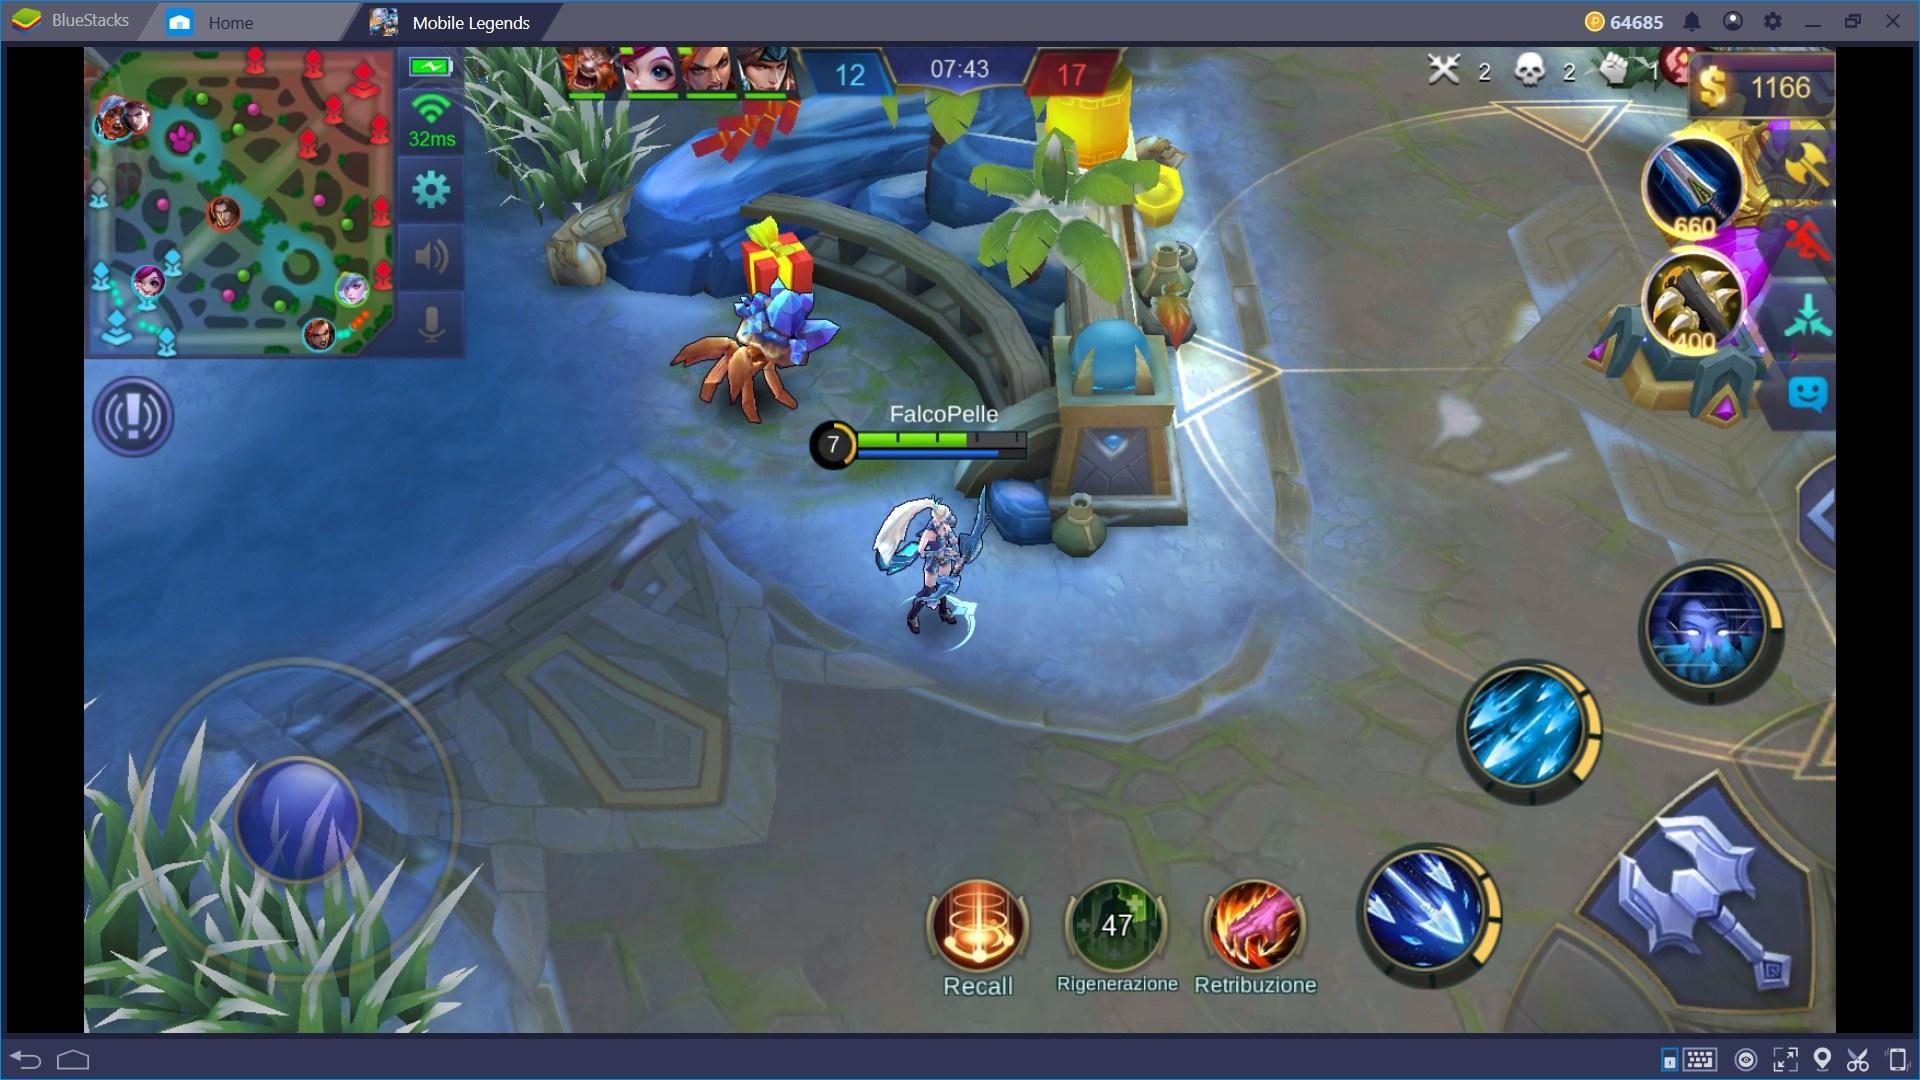 Affrontare le Corsie in Mobile Legends: Bang Bang